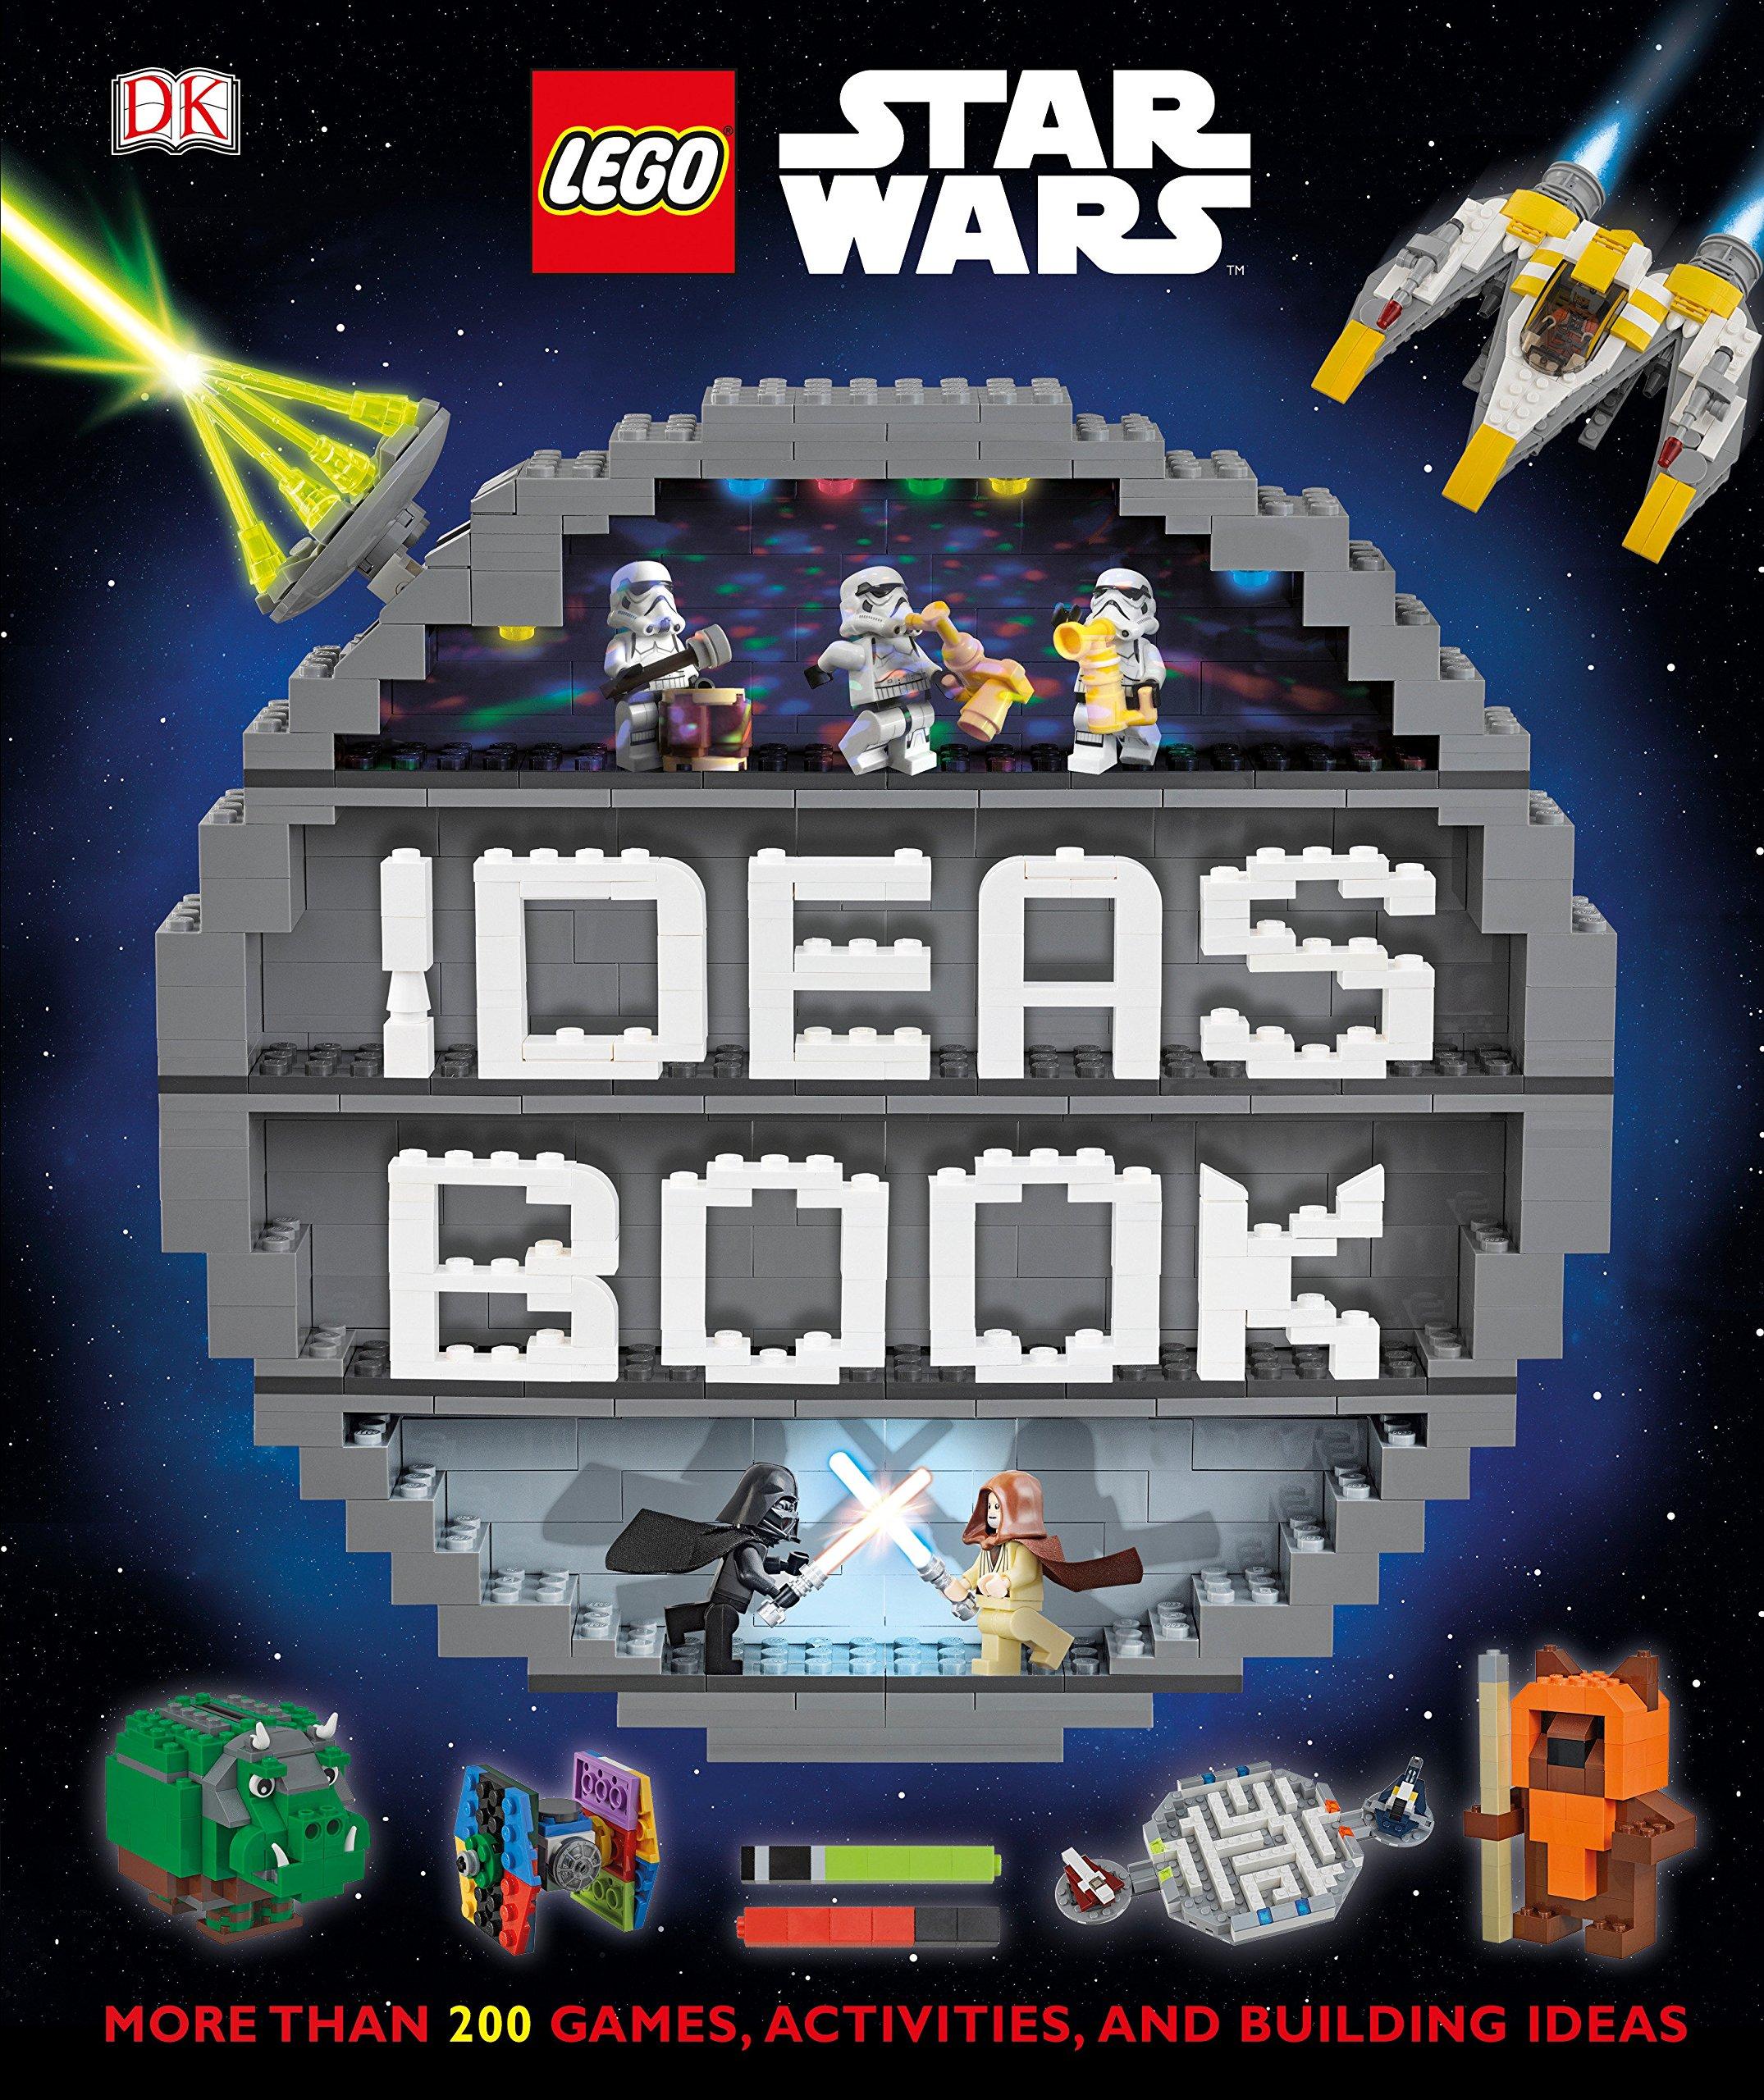 Lego Star Wars Ideas Book More Than 200 Games Activities And Building Ideas Dk Dowsett Elizabeth Dolan Hannah 9781465467058 Amazon Com Books